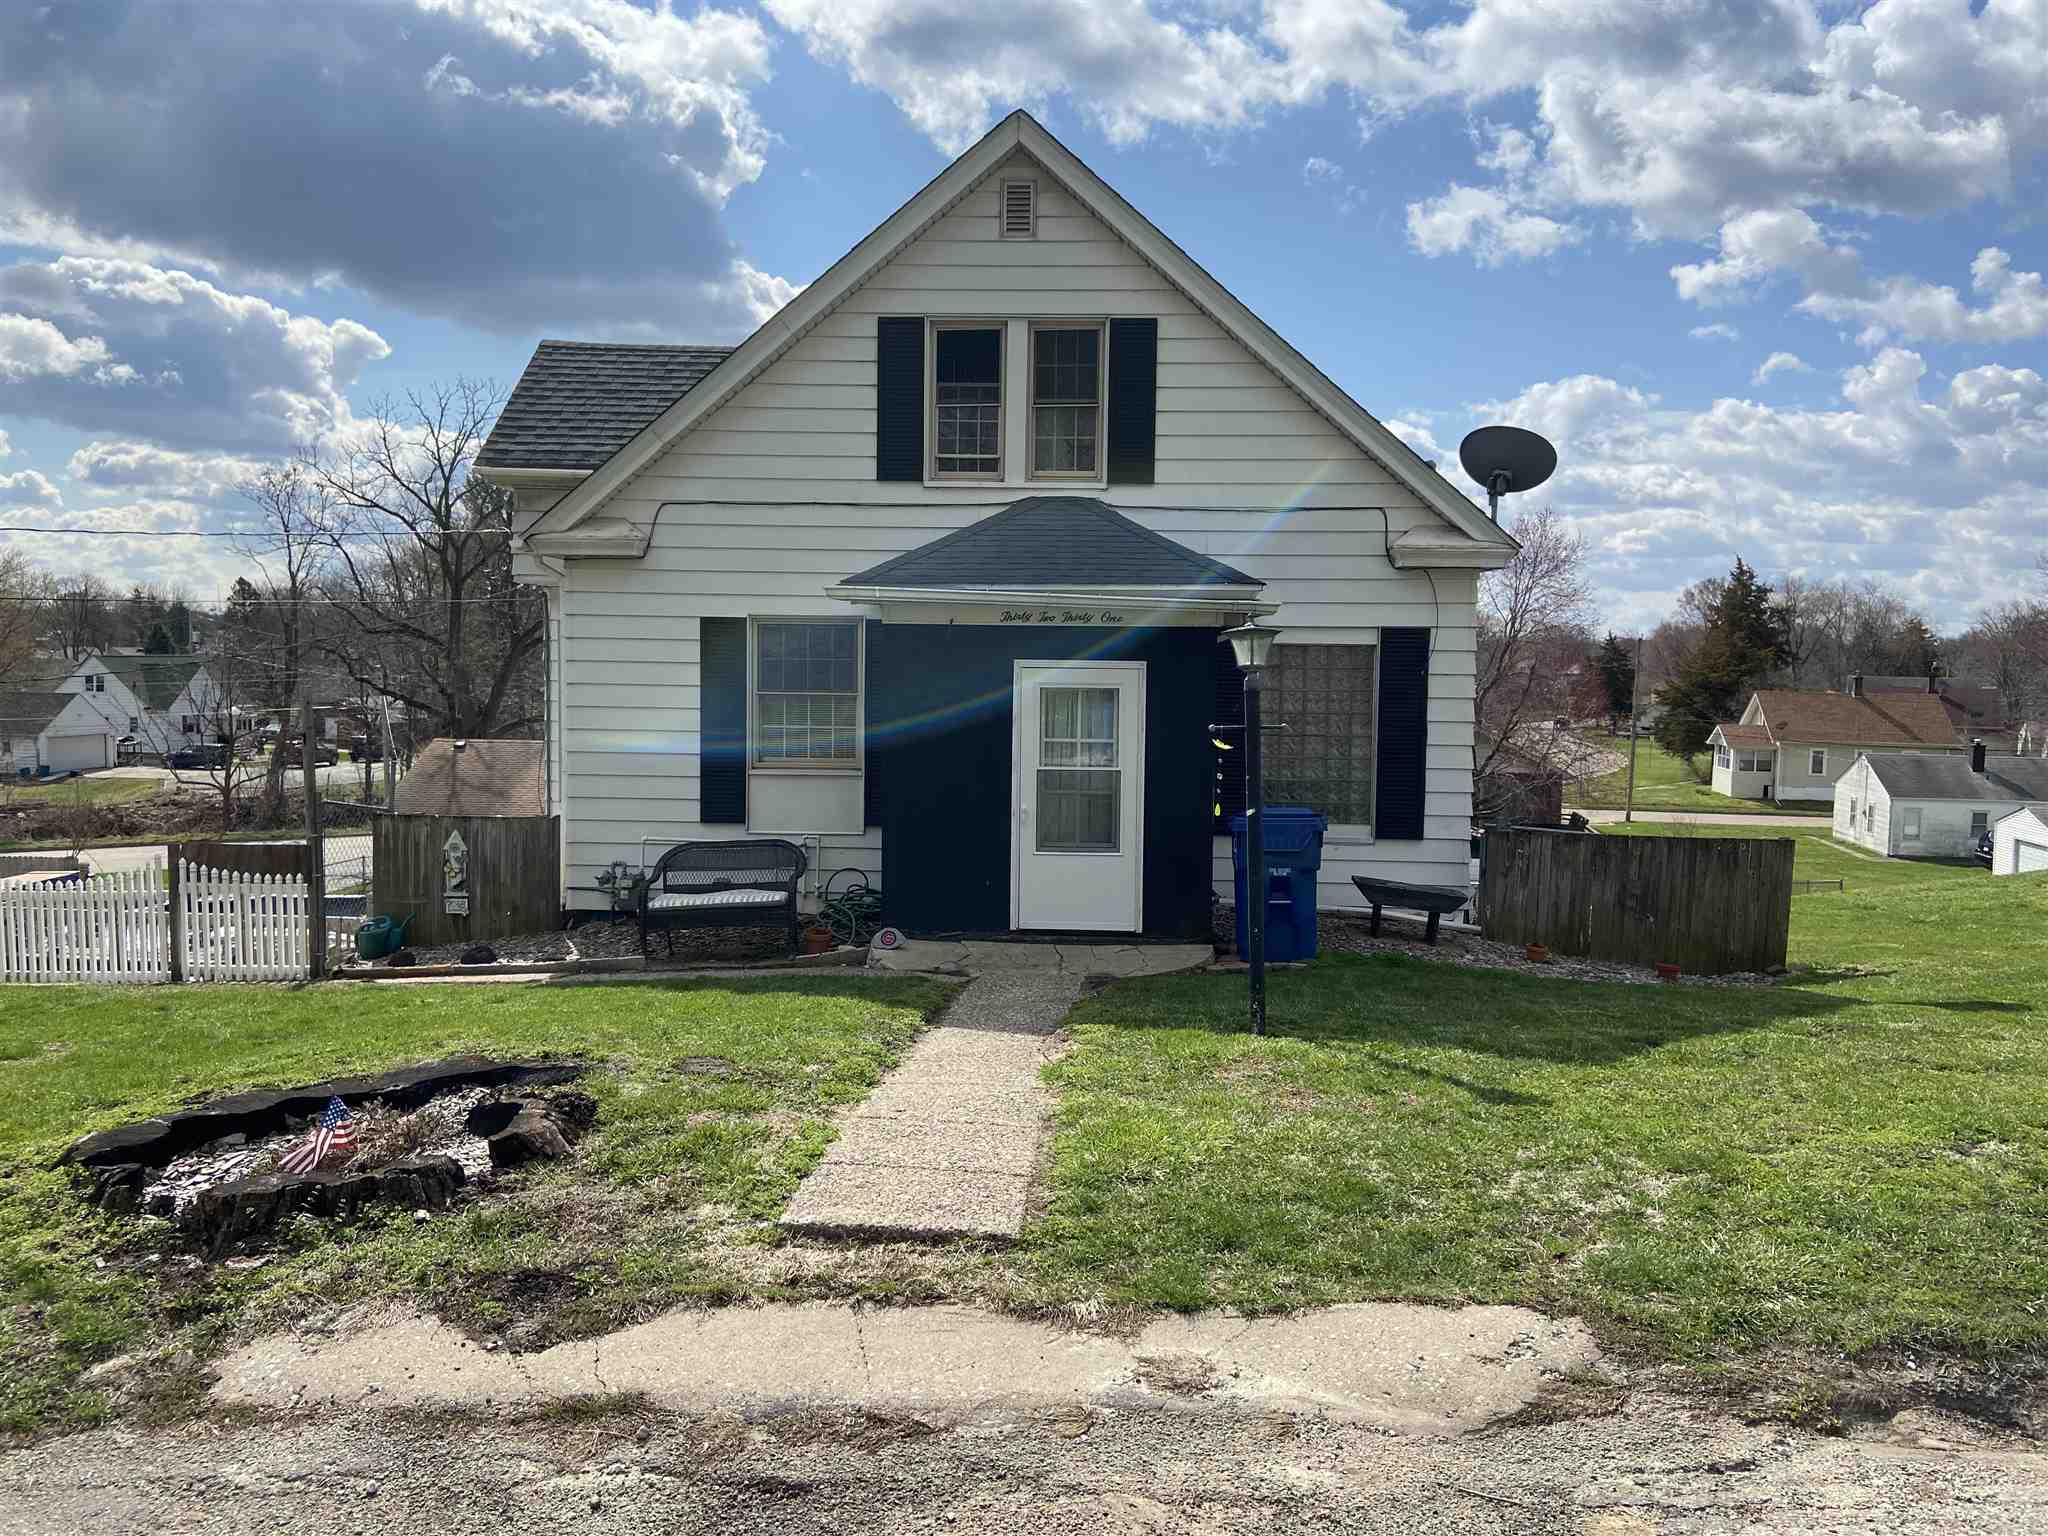 3231 DIEHN Property Photo - Davenport, IA real estate listing